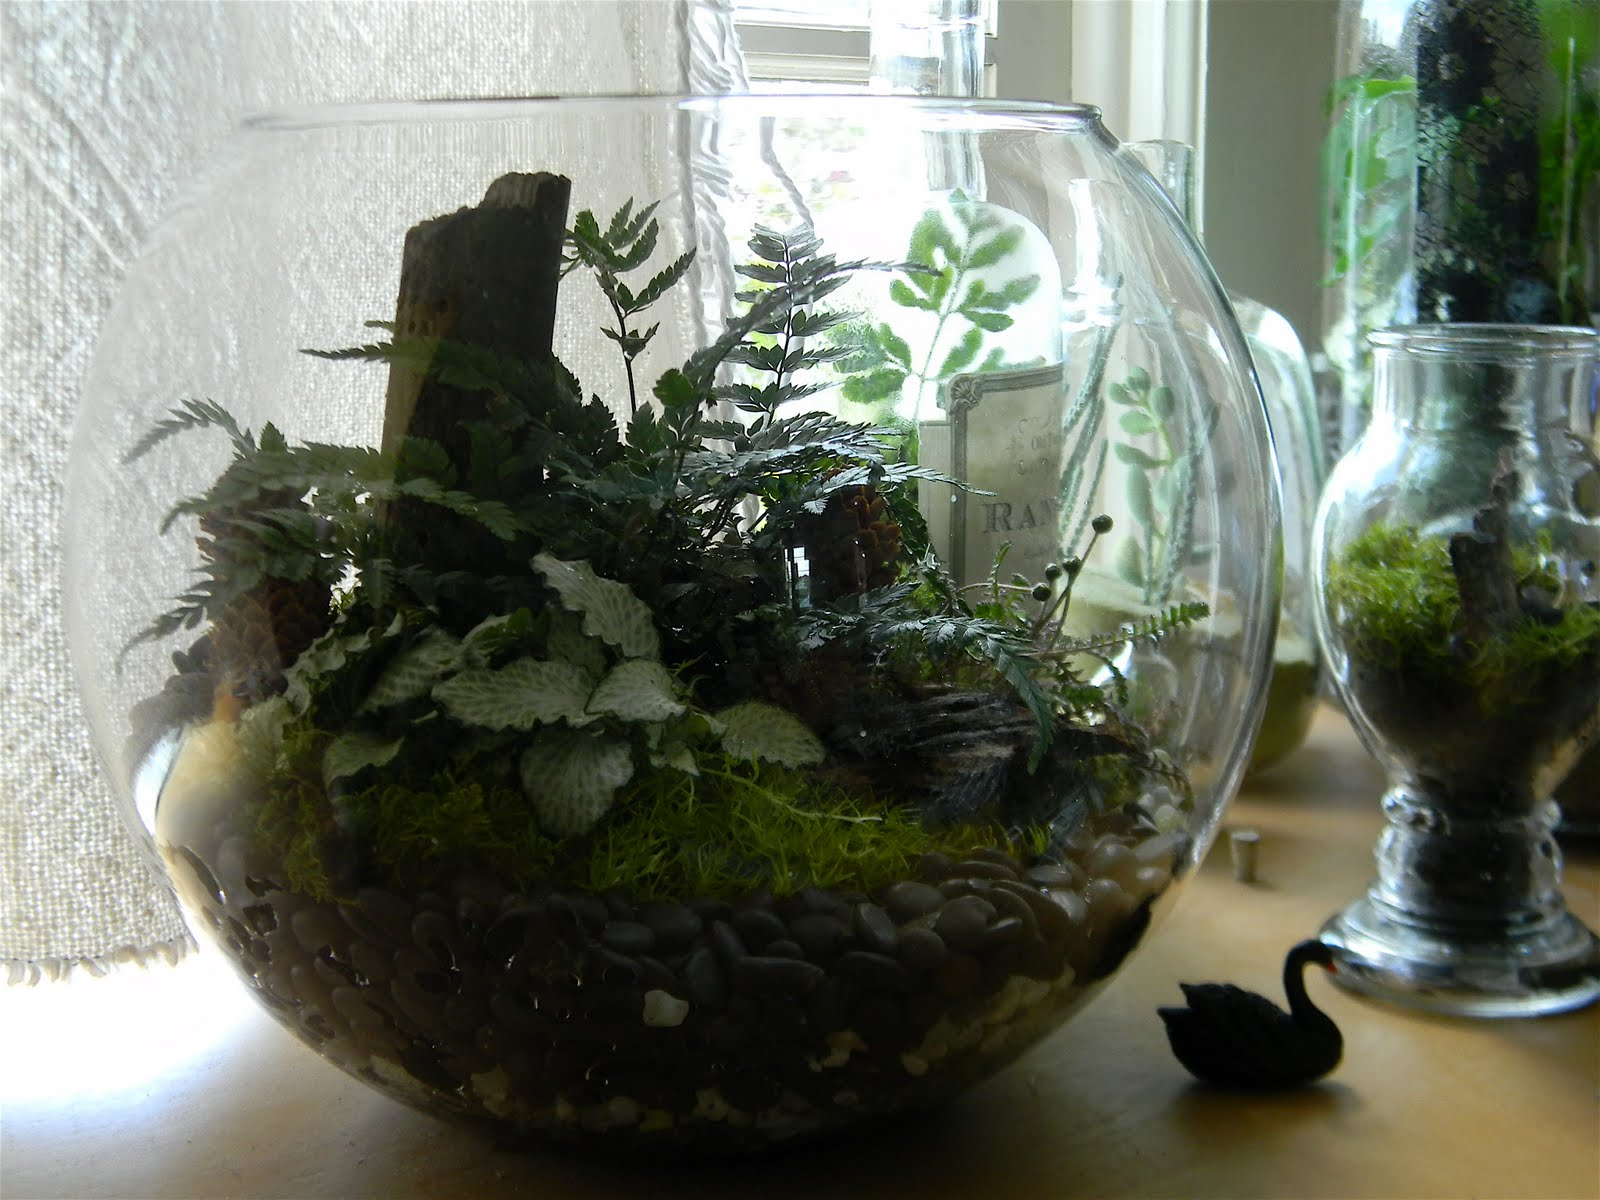 black swan garden design problems with terrariums. Black Bedroom Furniture Sets. Home Design Ideas